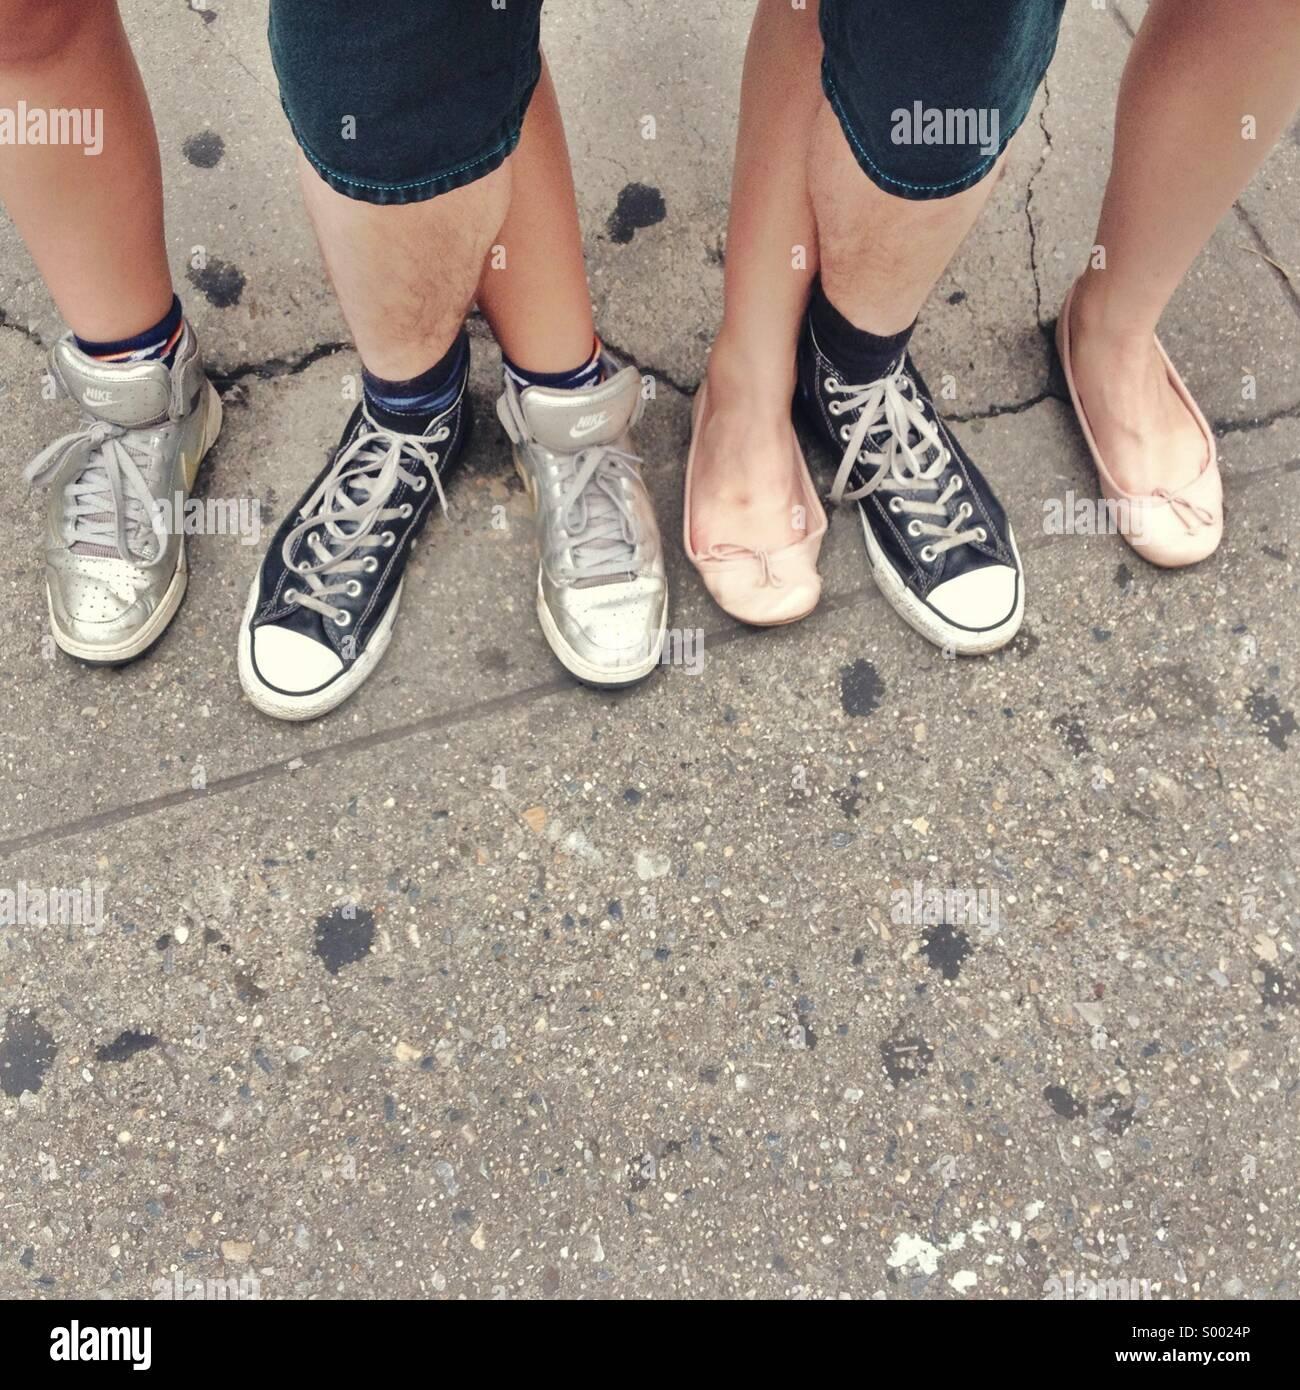 Sechs Fuß Stockbild